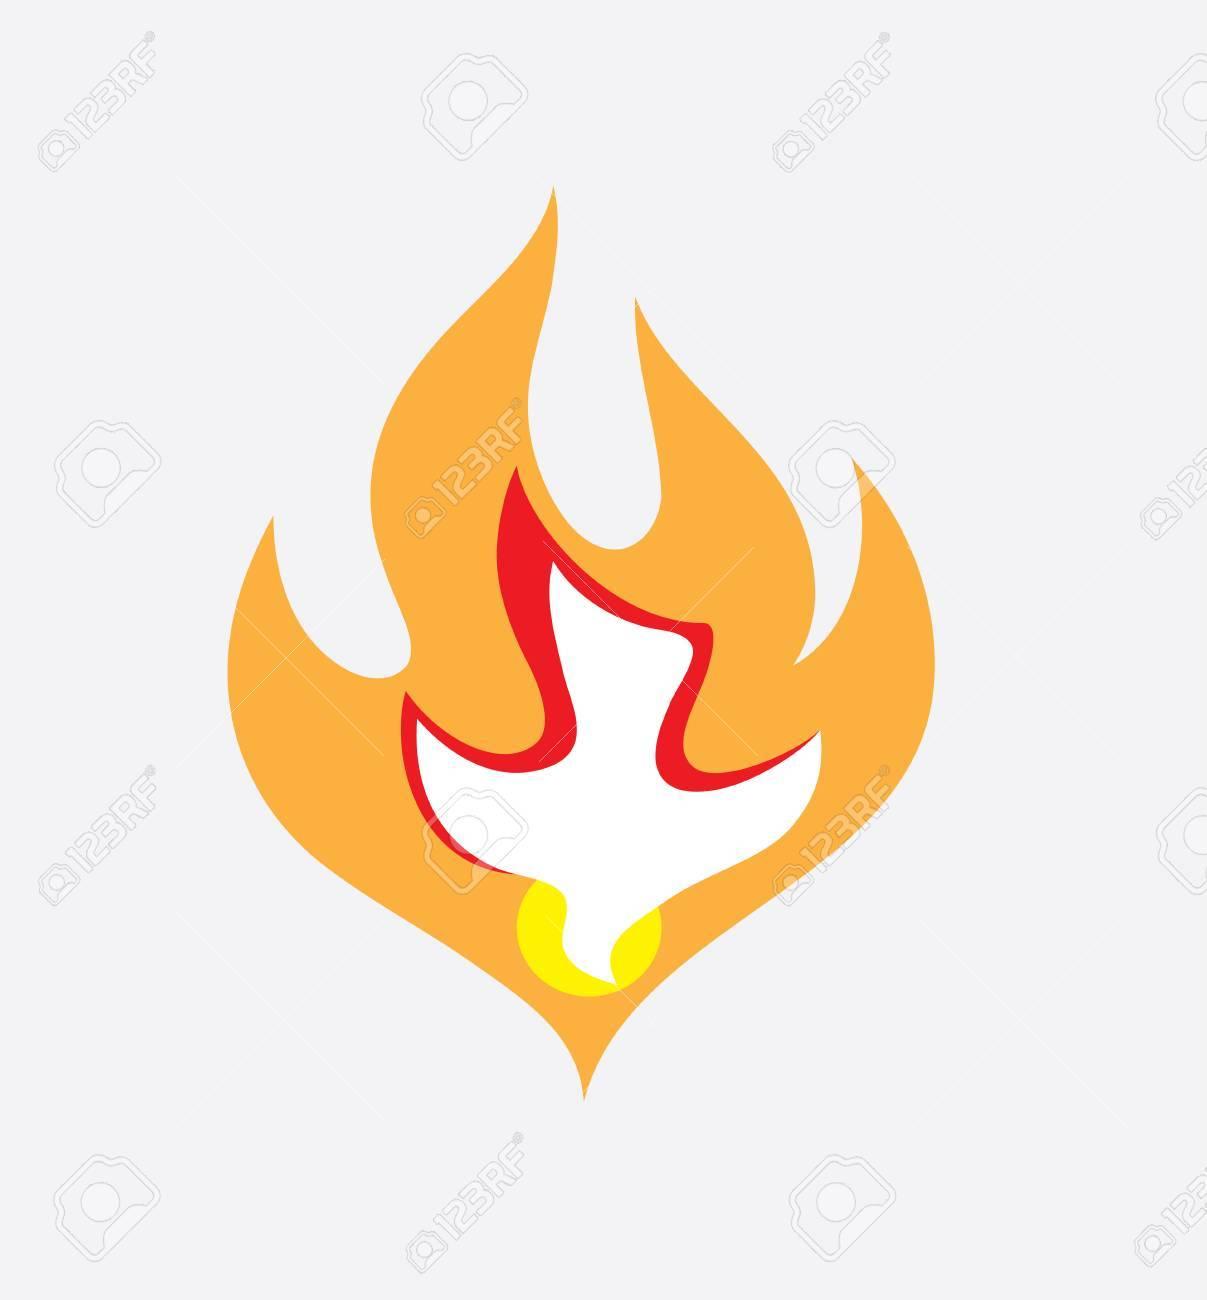 holy spirit fire art vector design royalty free cliparts vectors